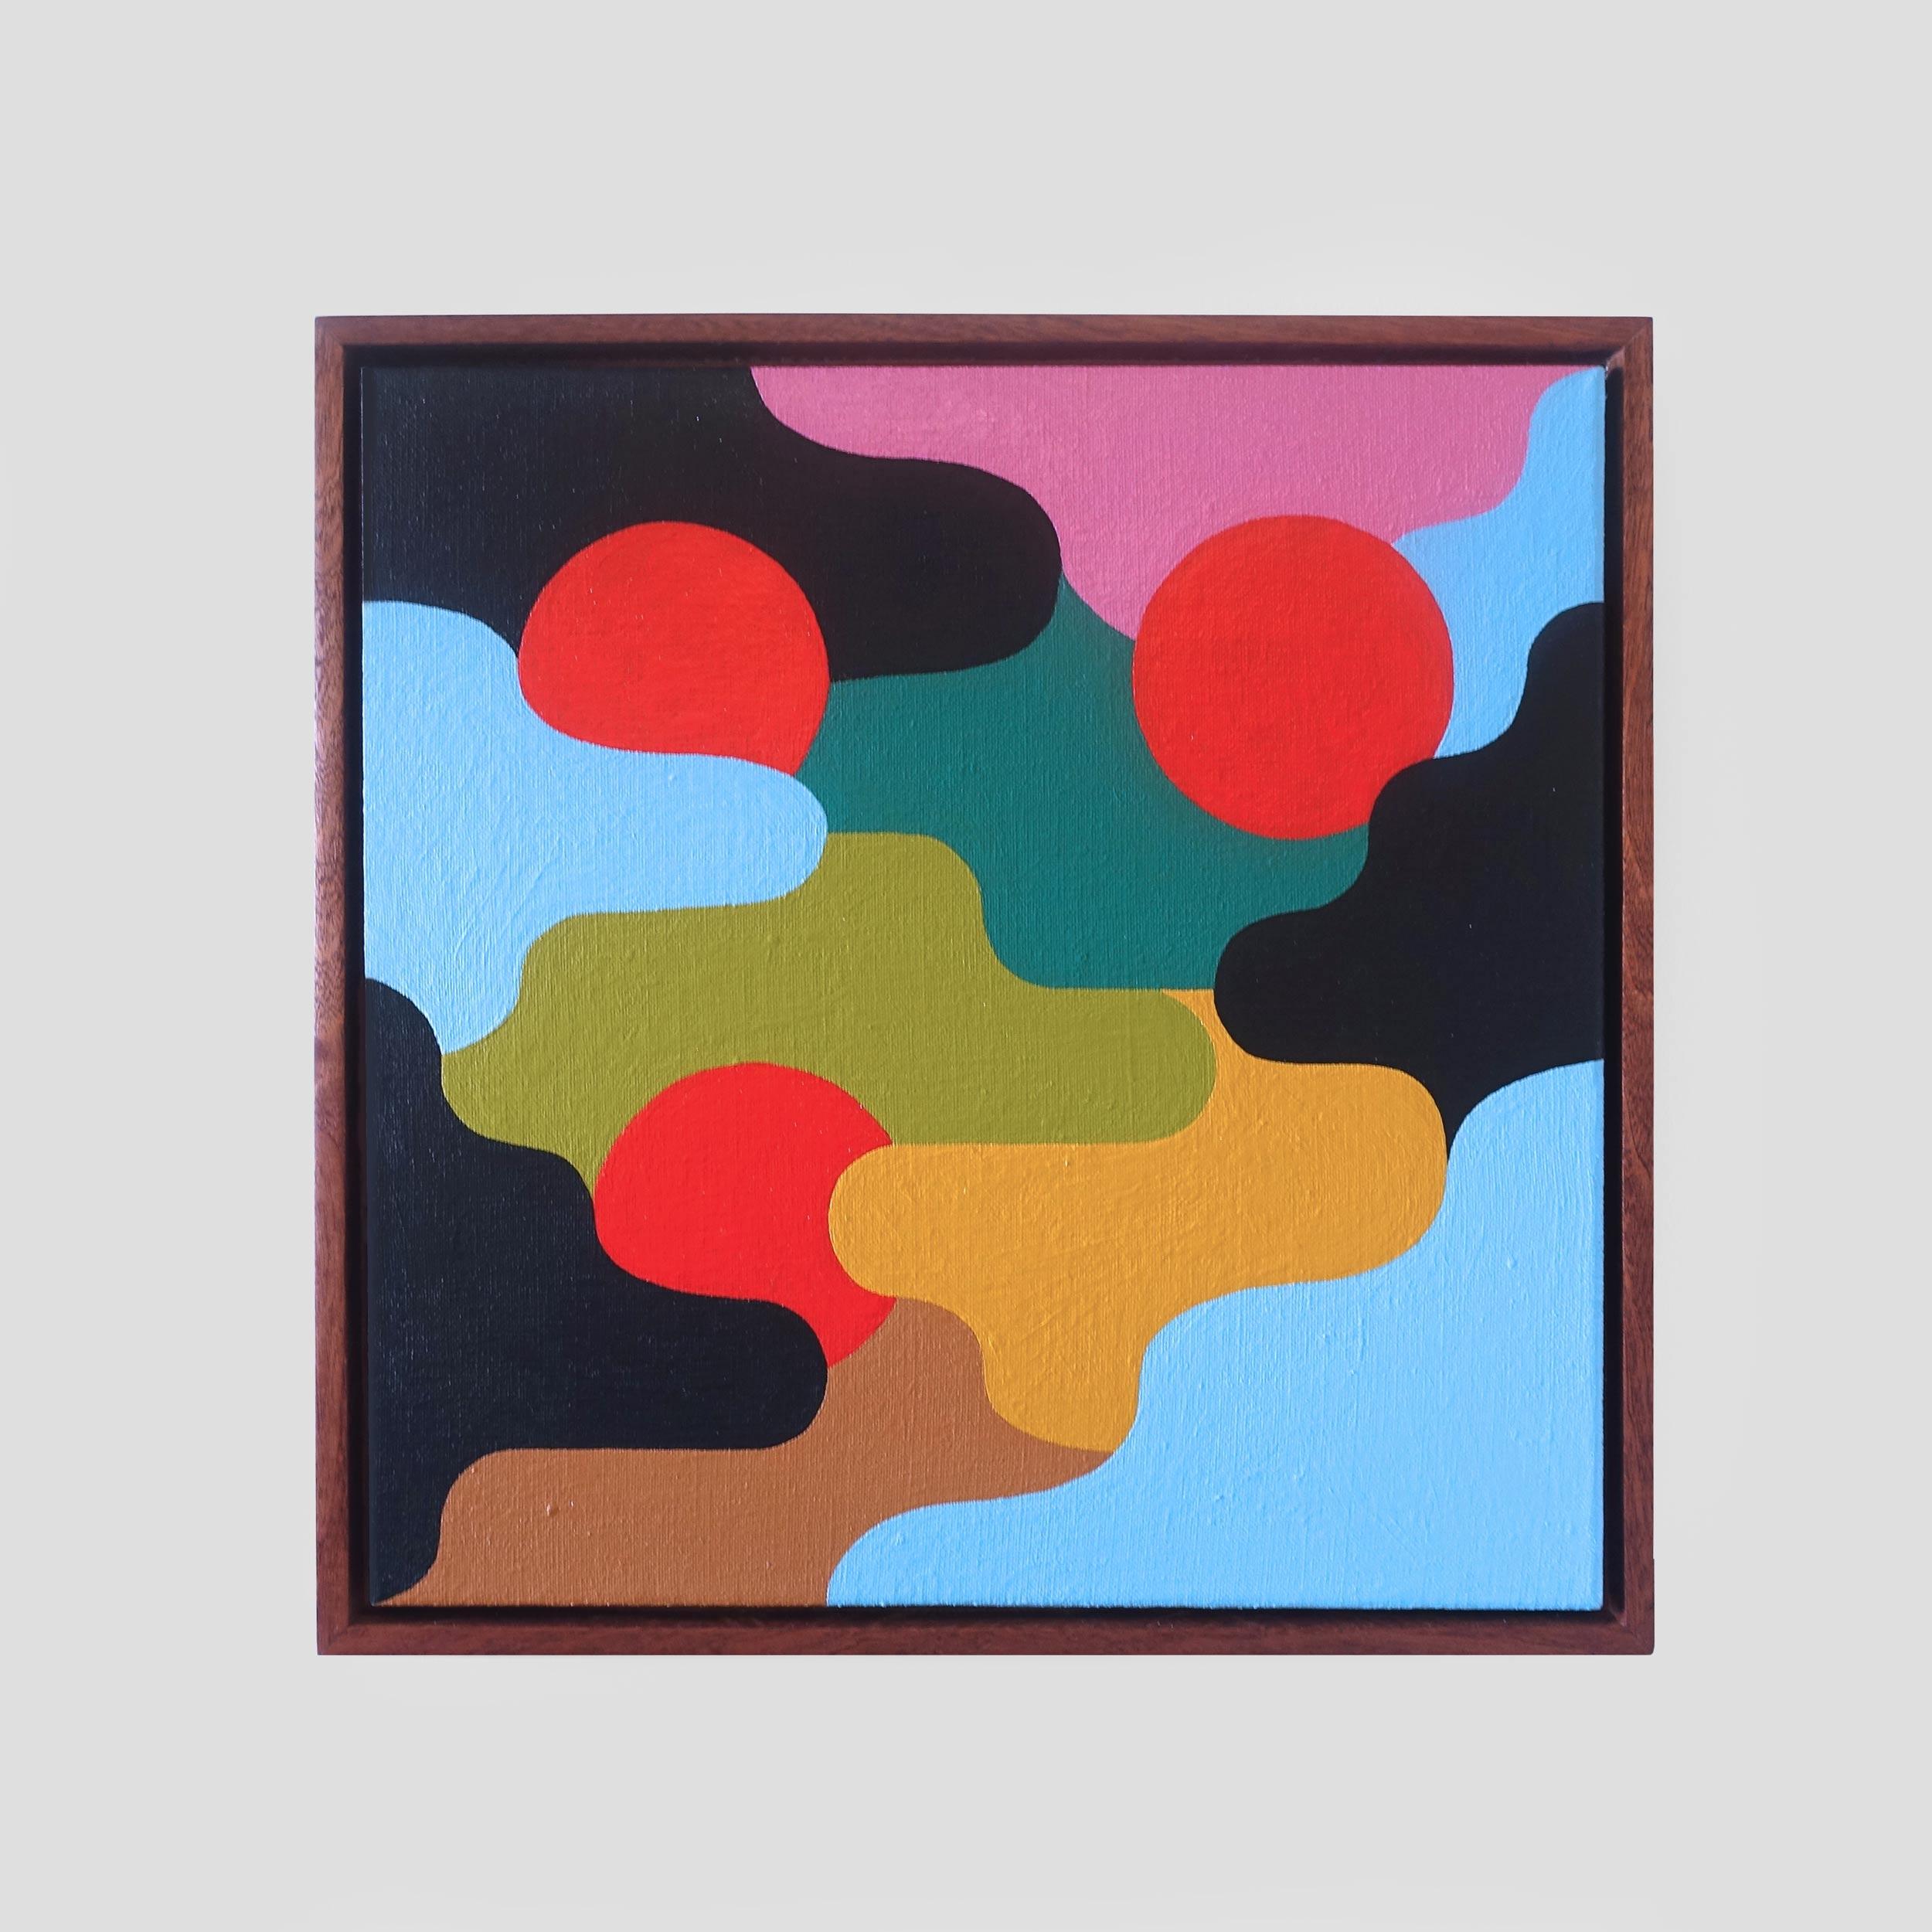 Square Composition 8 40 cm acry - samsmythart | ello